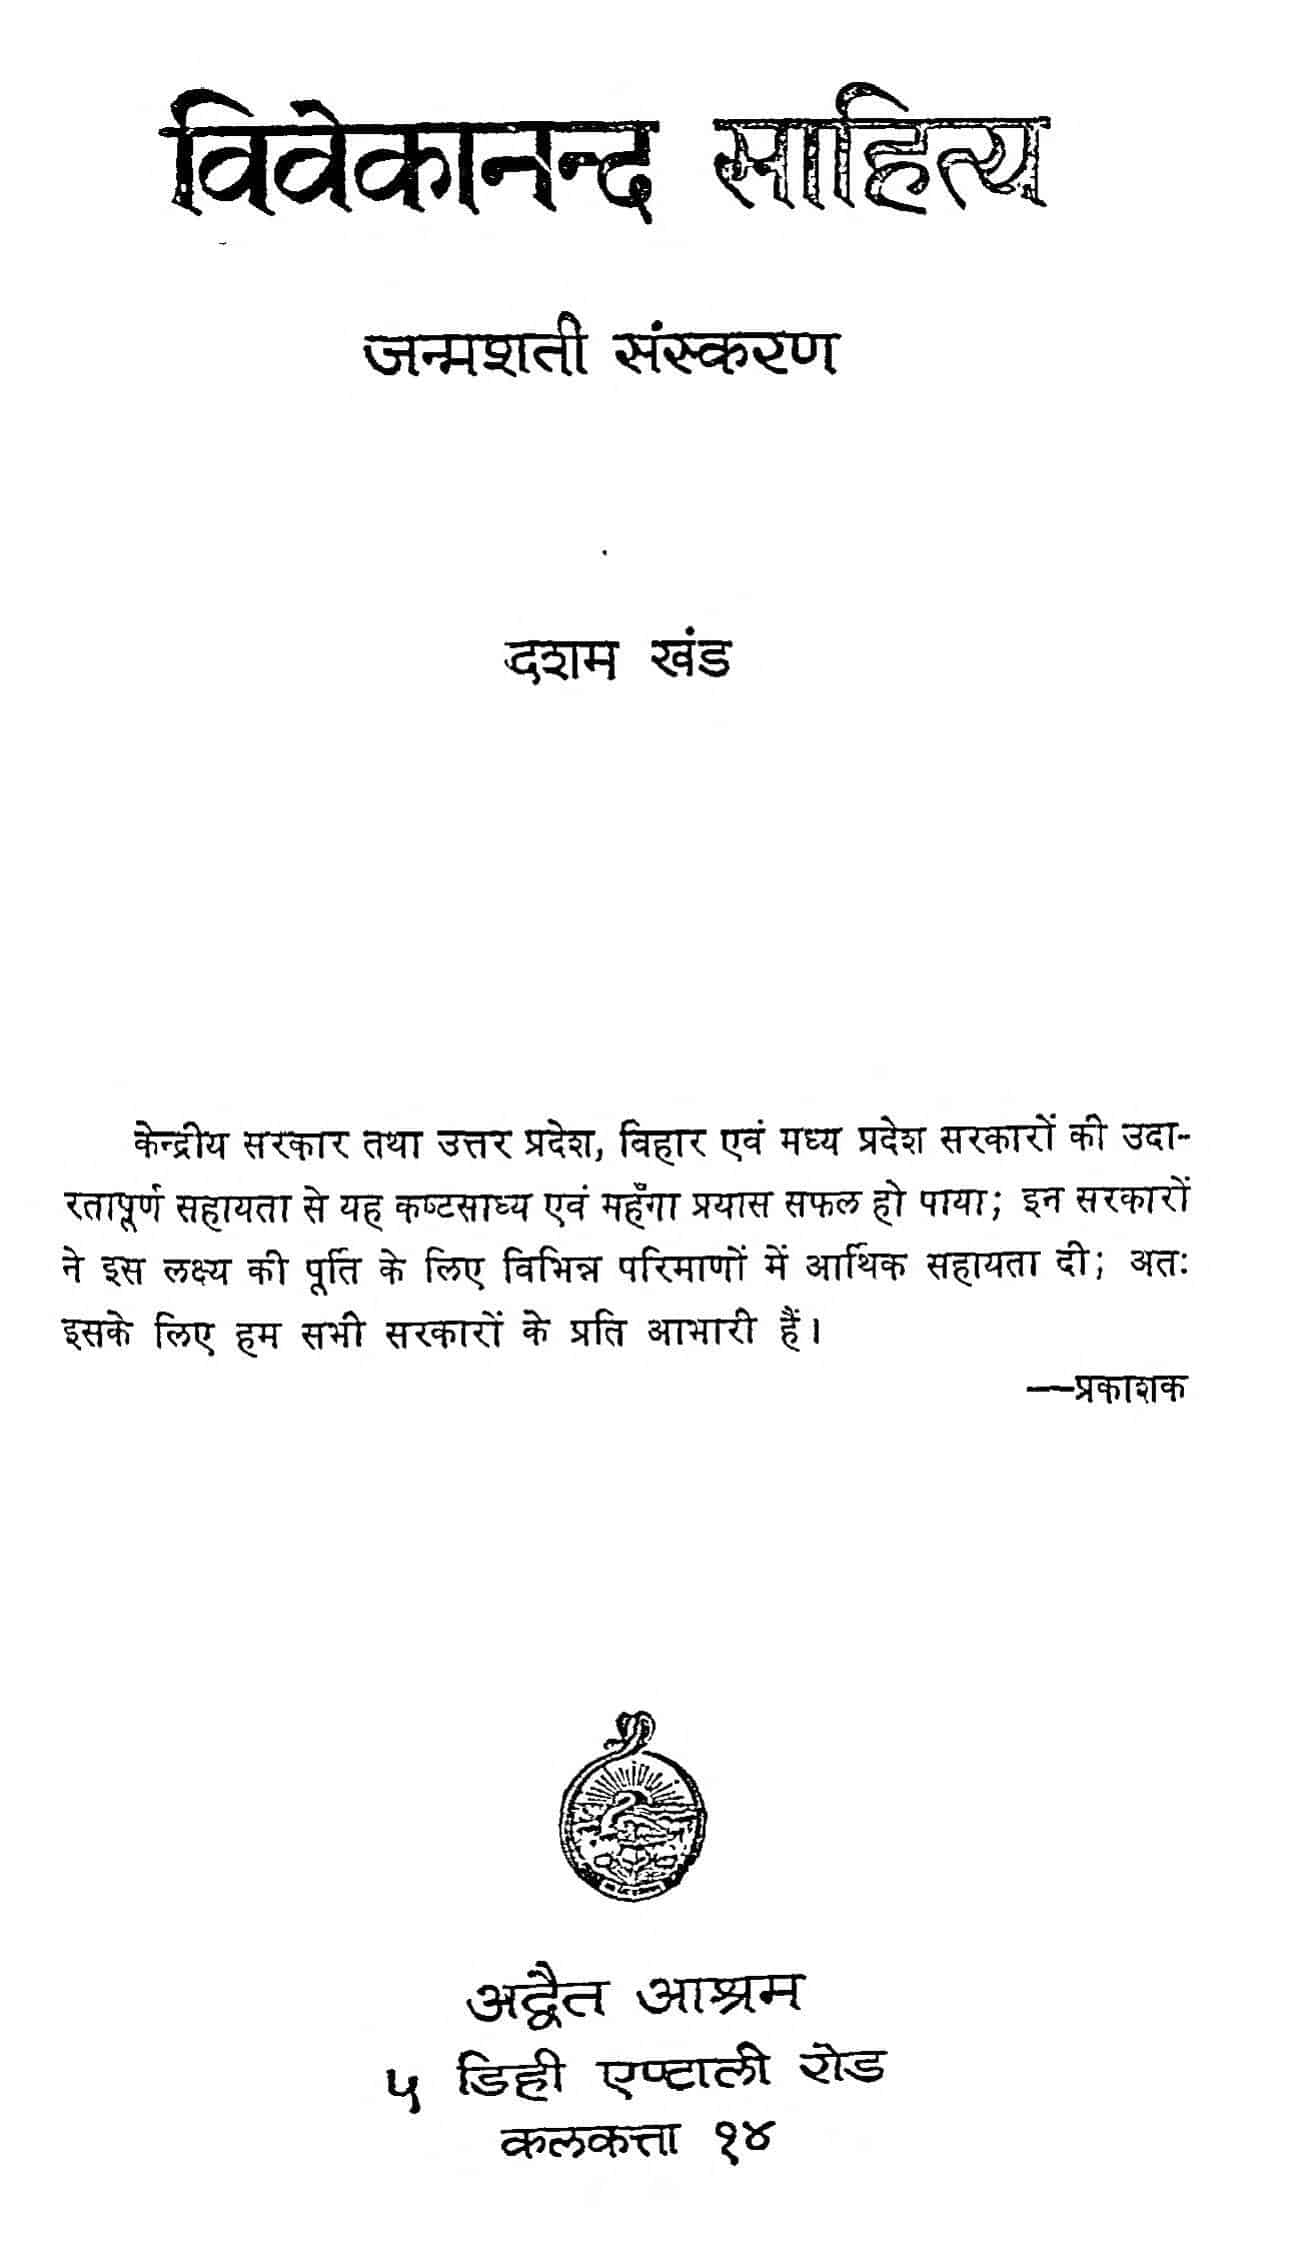 Book Image : विवेकानन्द साहित्य जन्मशती संस्करण खंड 10 - Vivekanand Sahitya Janmshati Sanskaran Khand-x